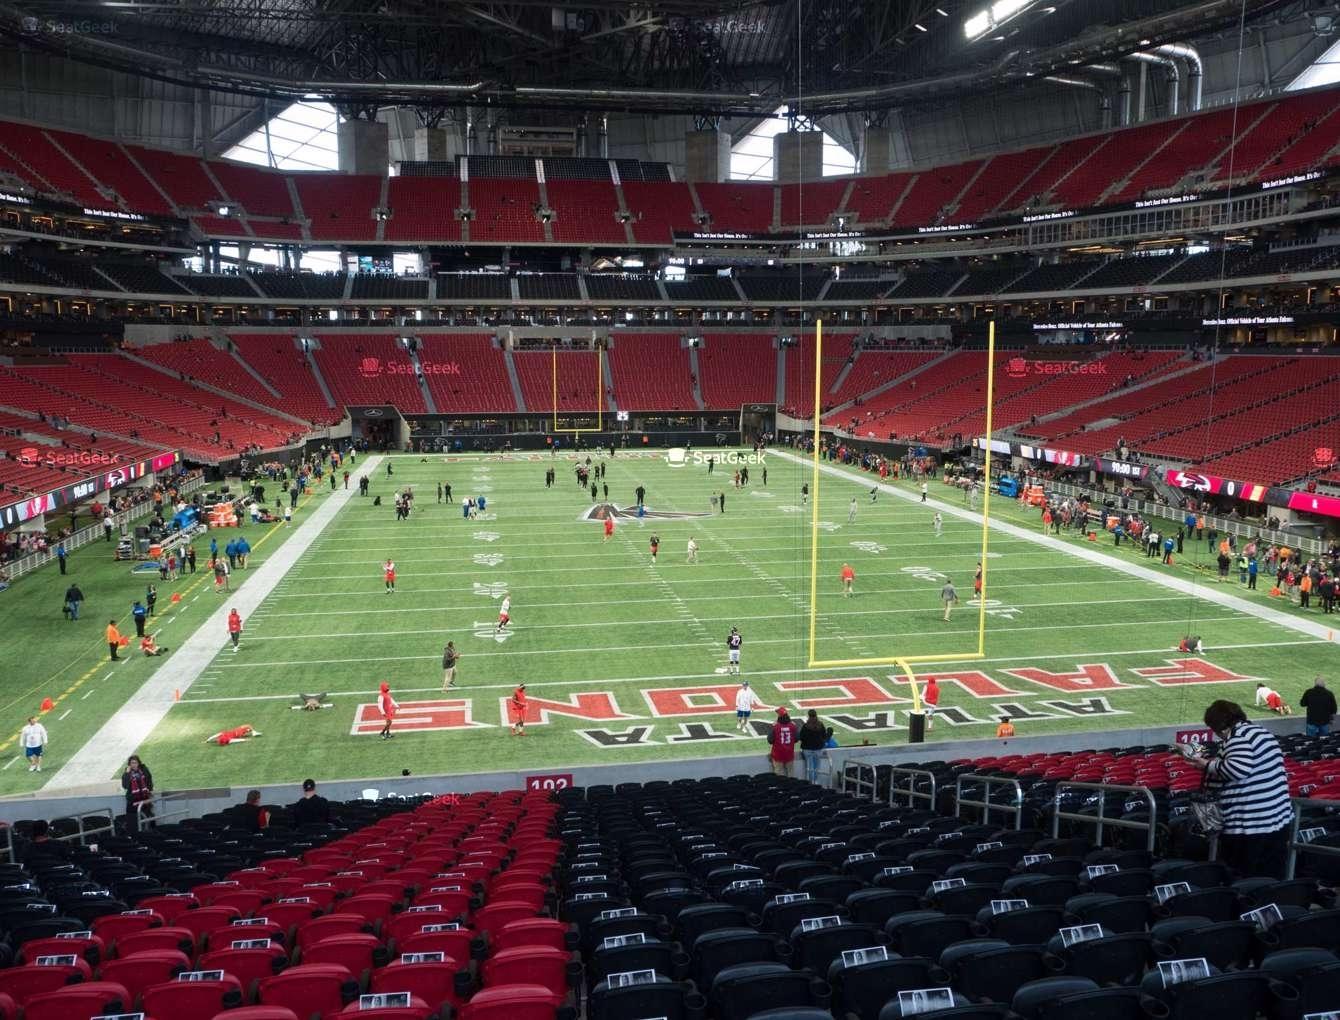 Mercedes-Benz Stadium Section 102 Seat Views | Seatgeek inside Mercedes Benz Stadium Super Bowl Seating Chart